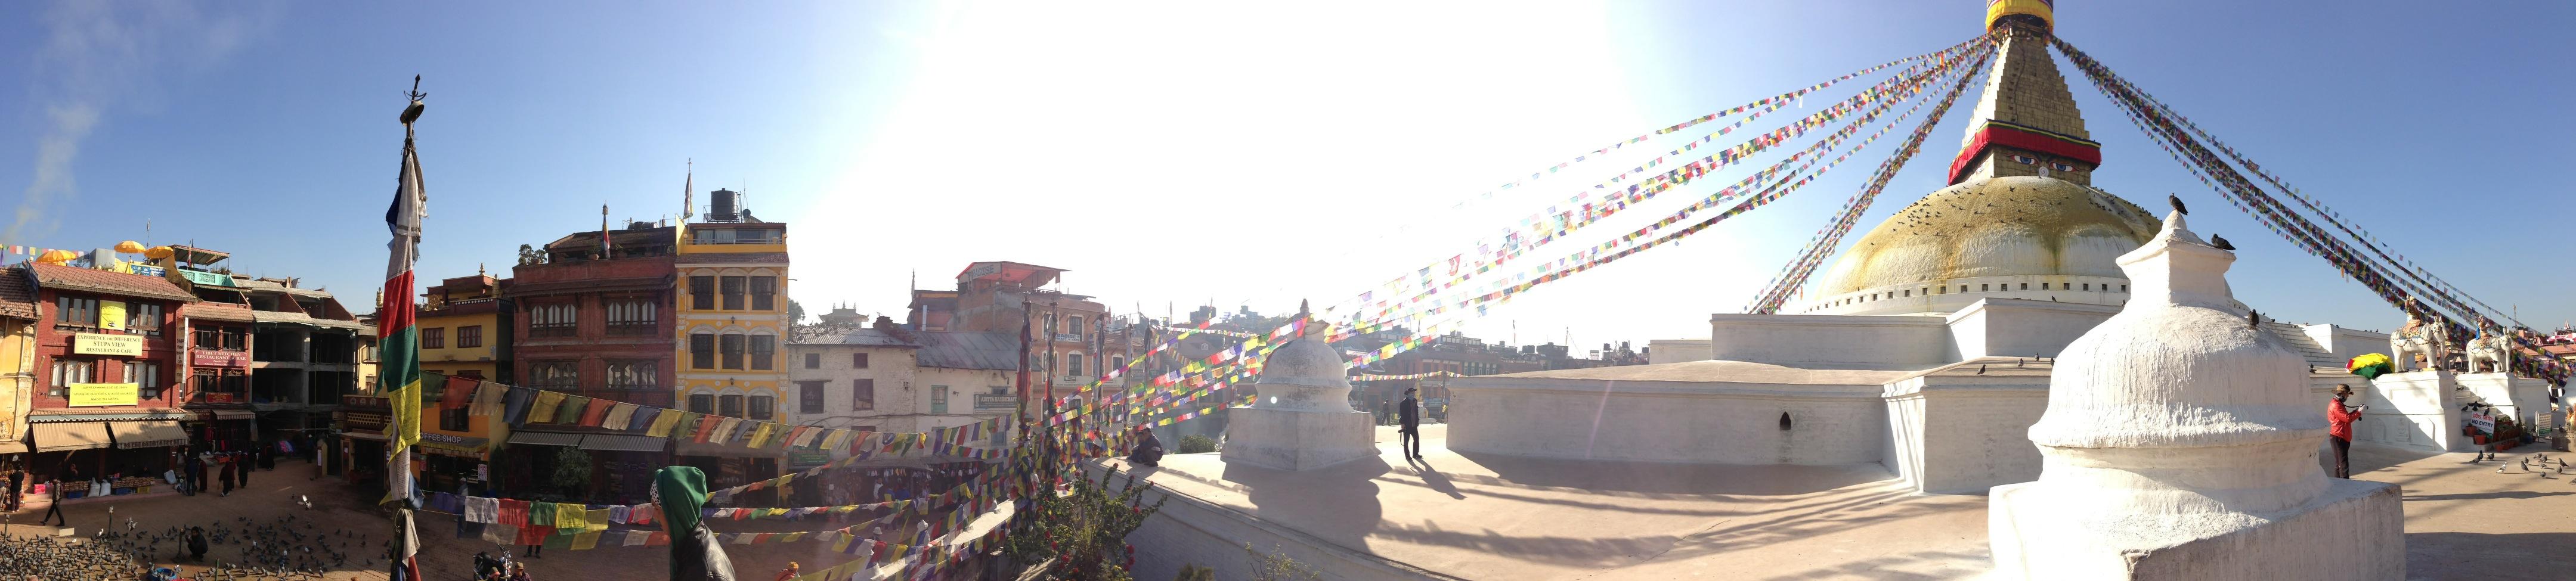 Bodnath-Stupa in Kathmandu